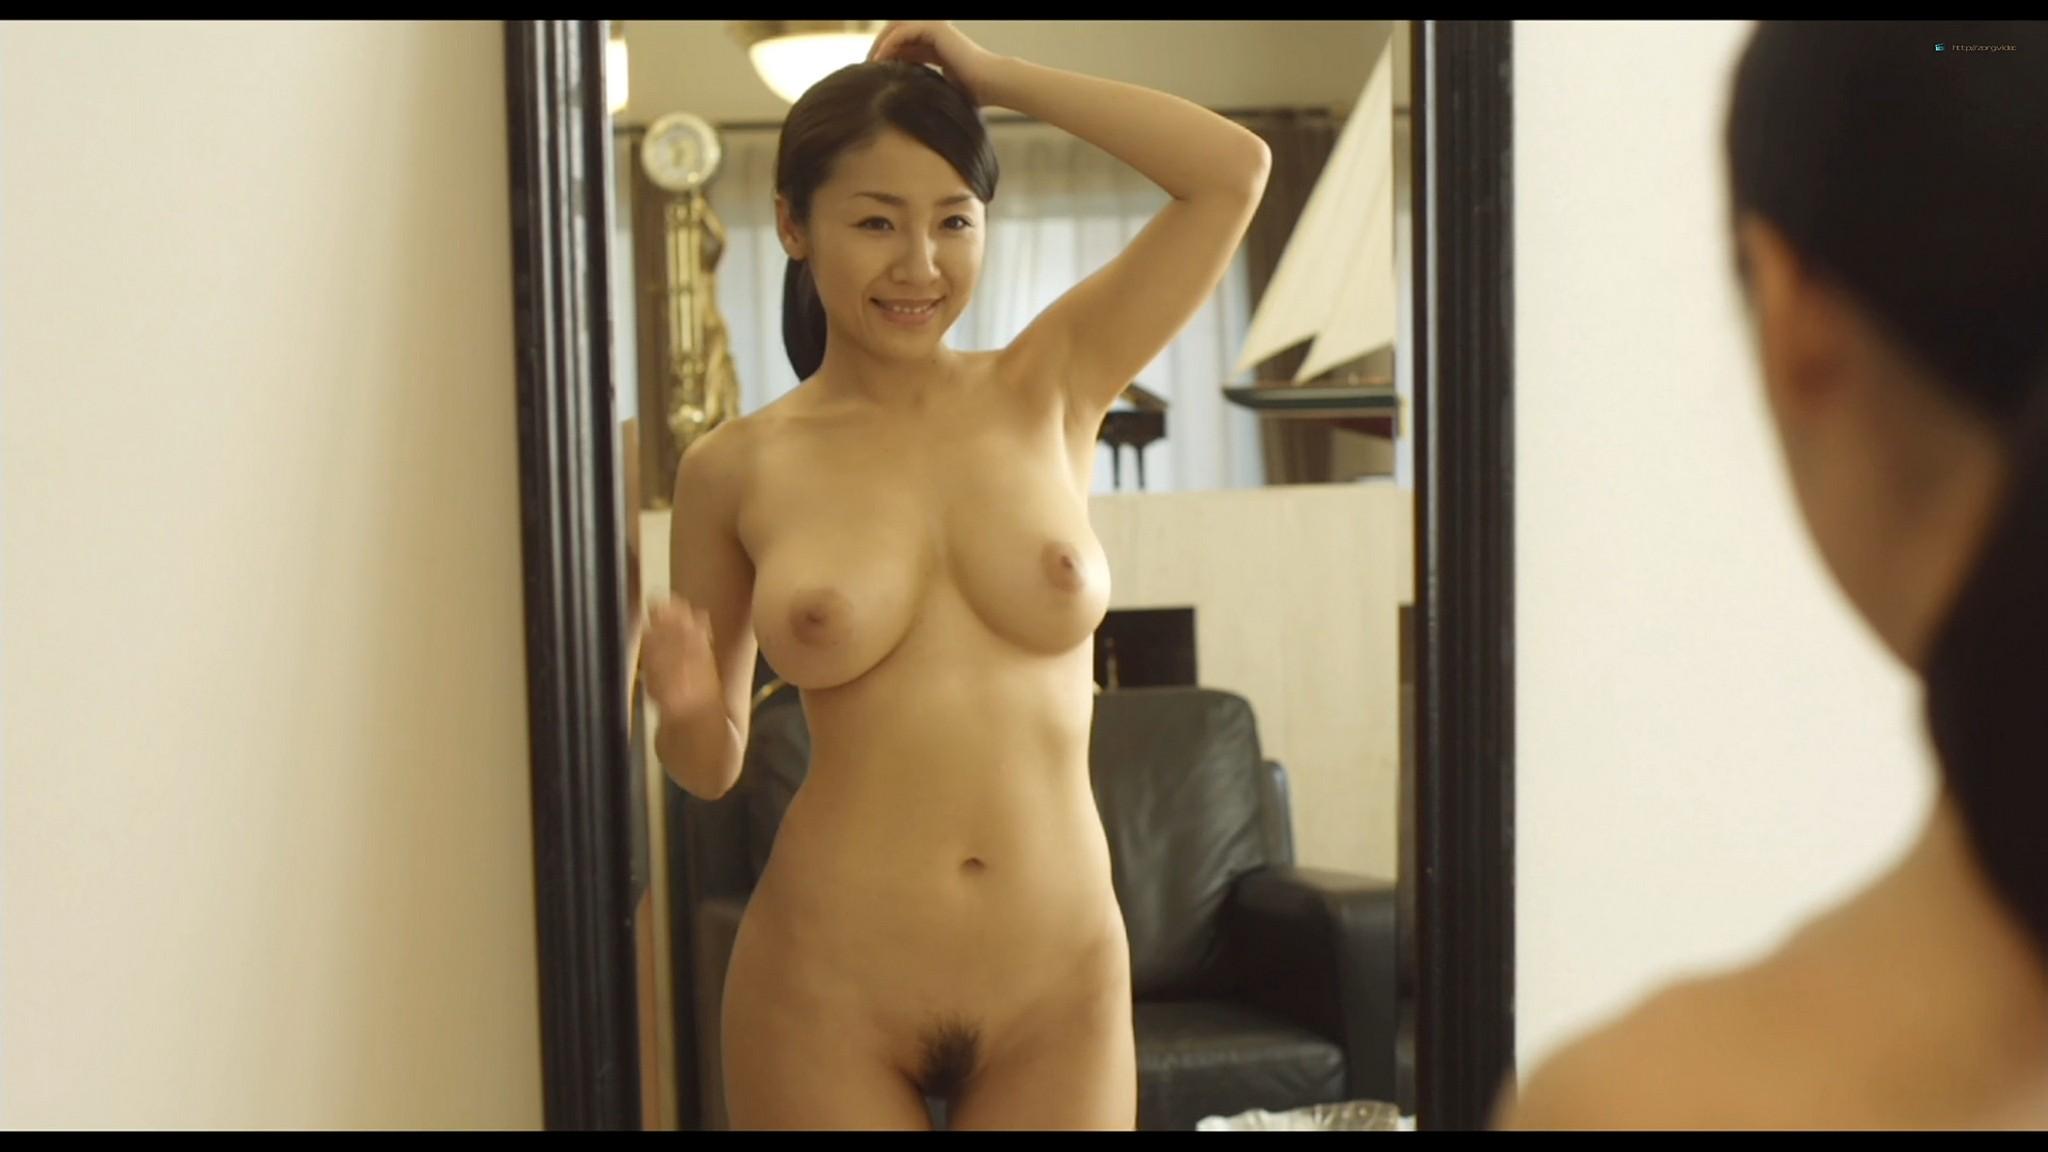 Megumi Kagurazaka nude full frontal Makoto Togashi nude too Guilty of Romance JP 2011 HD 1080p BluRay 02